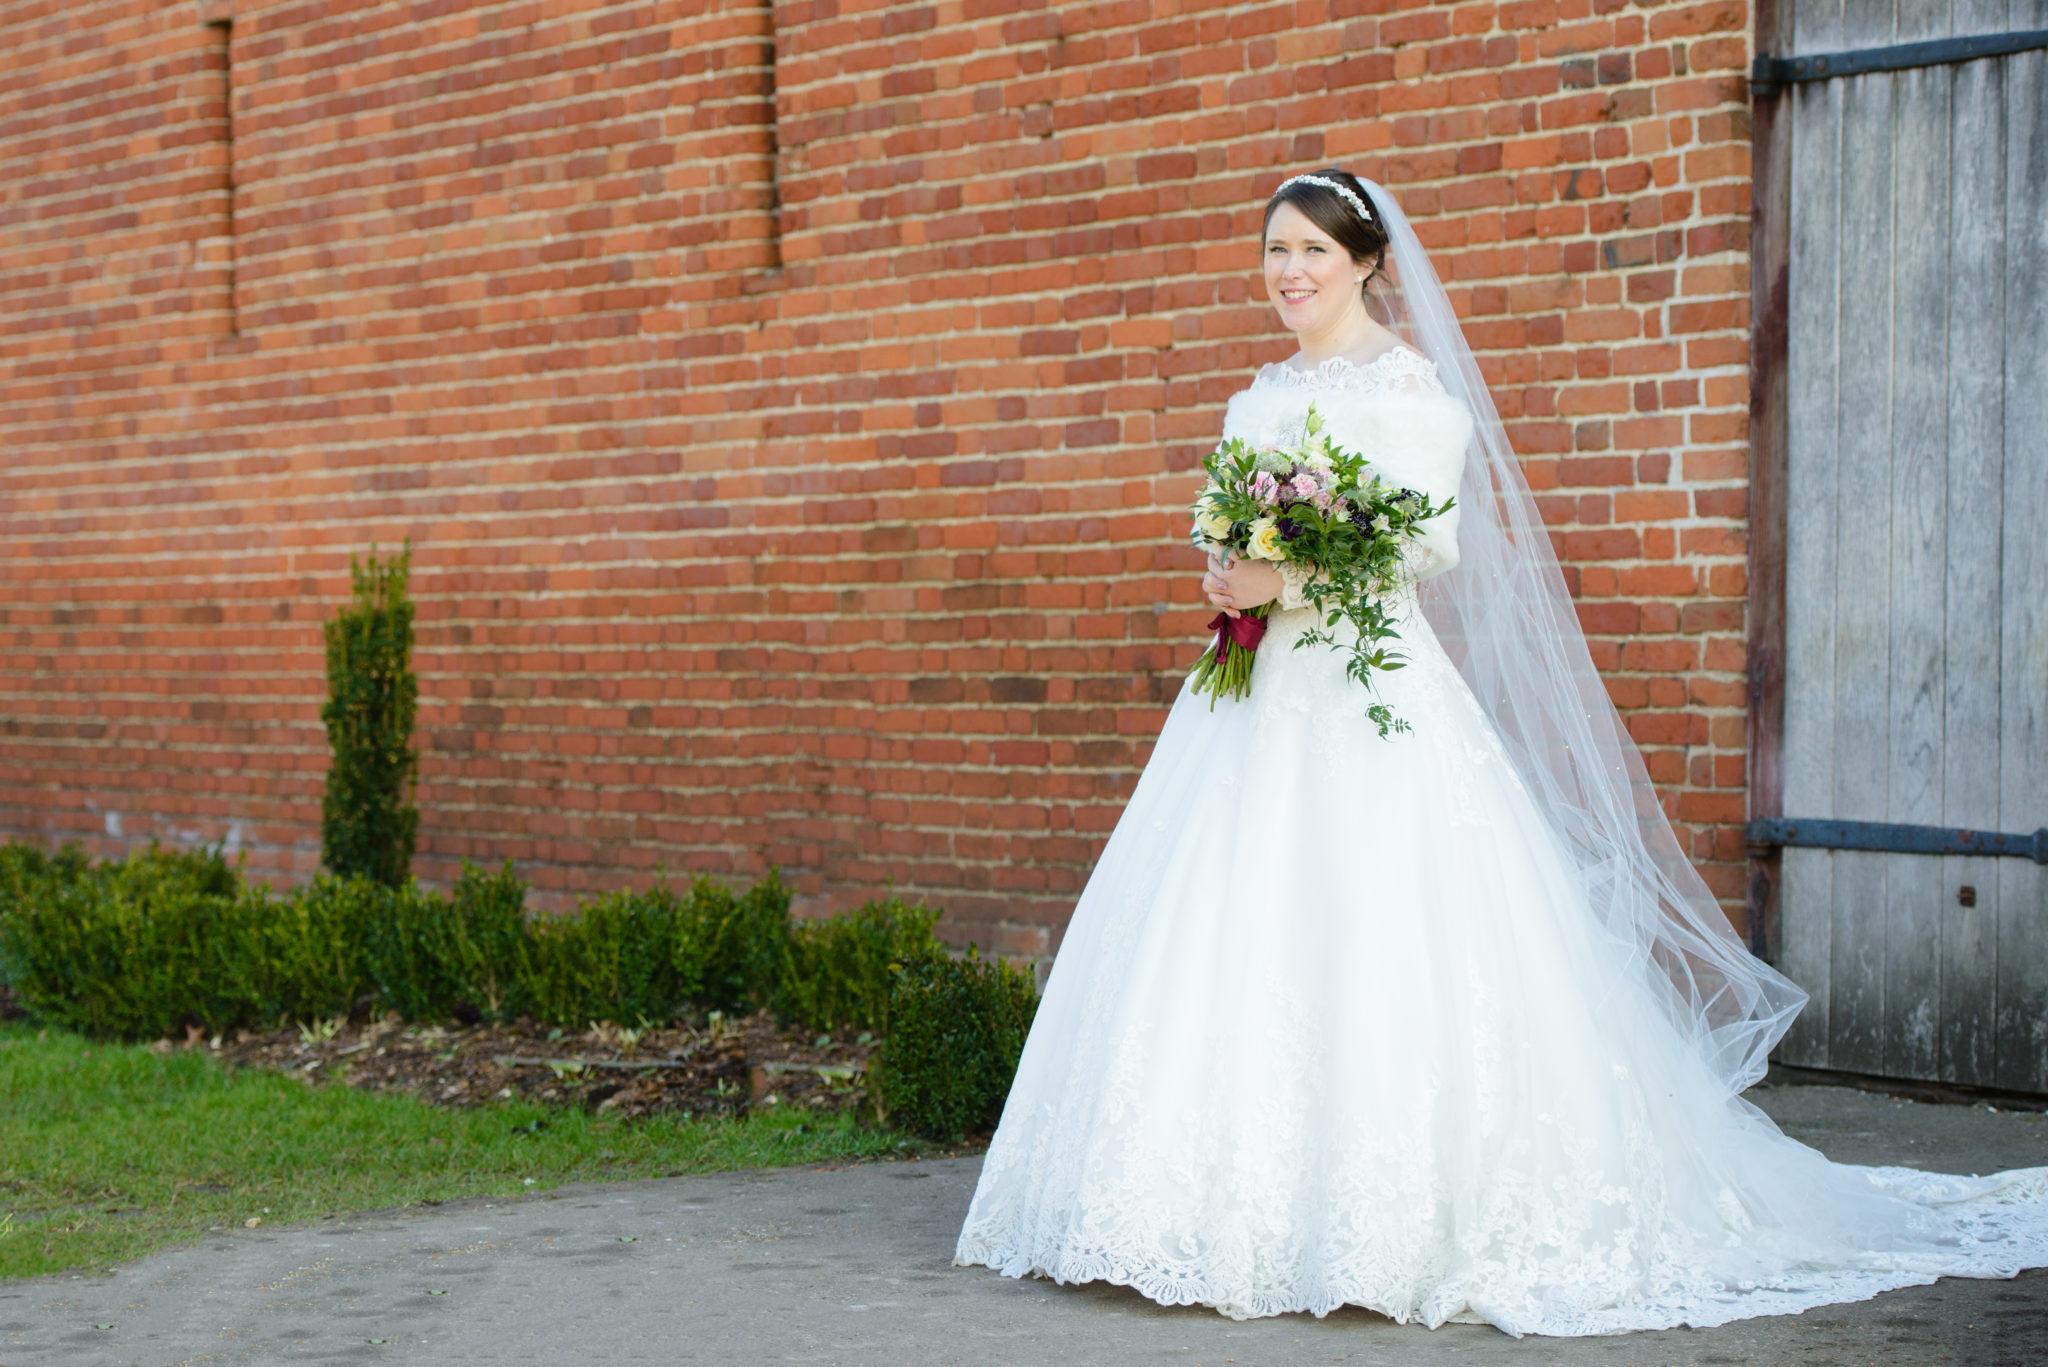 Real bride Pip